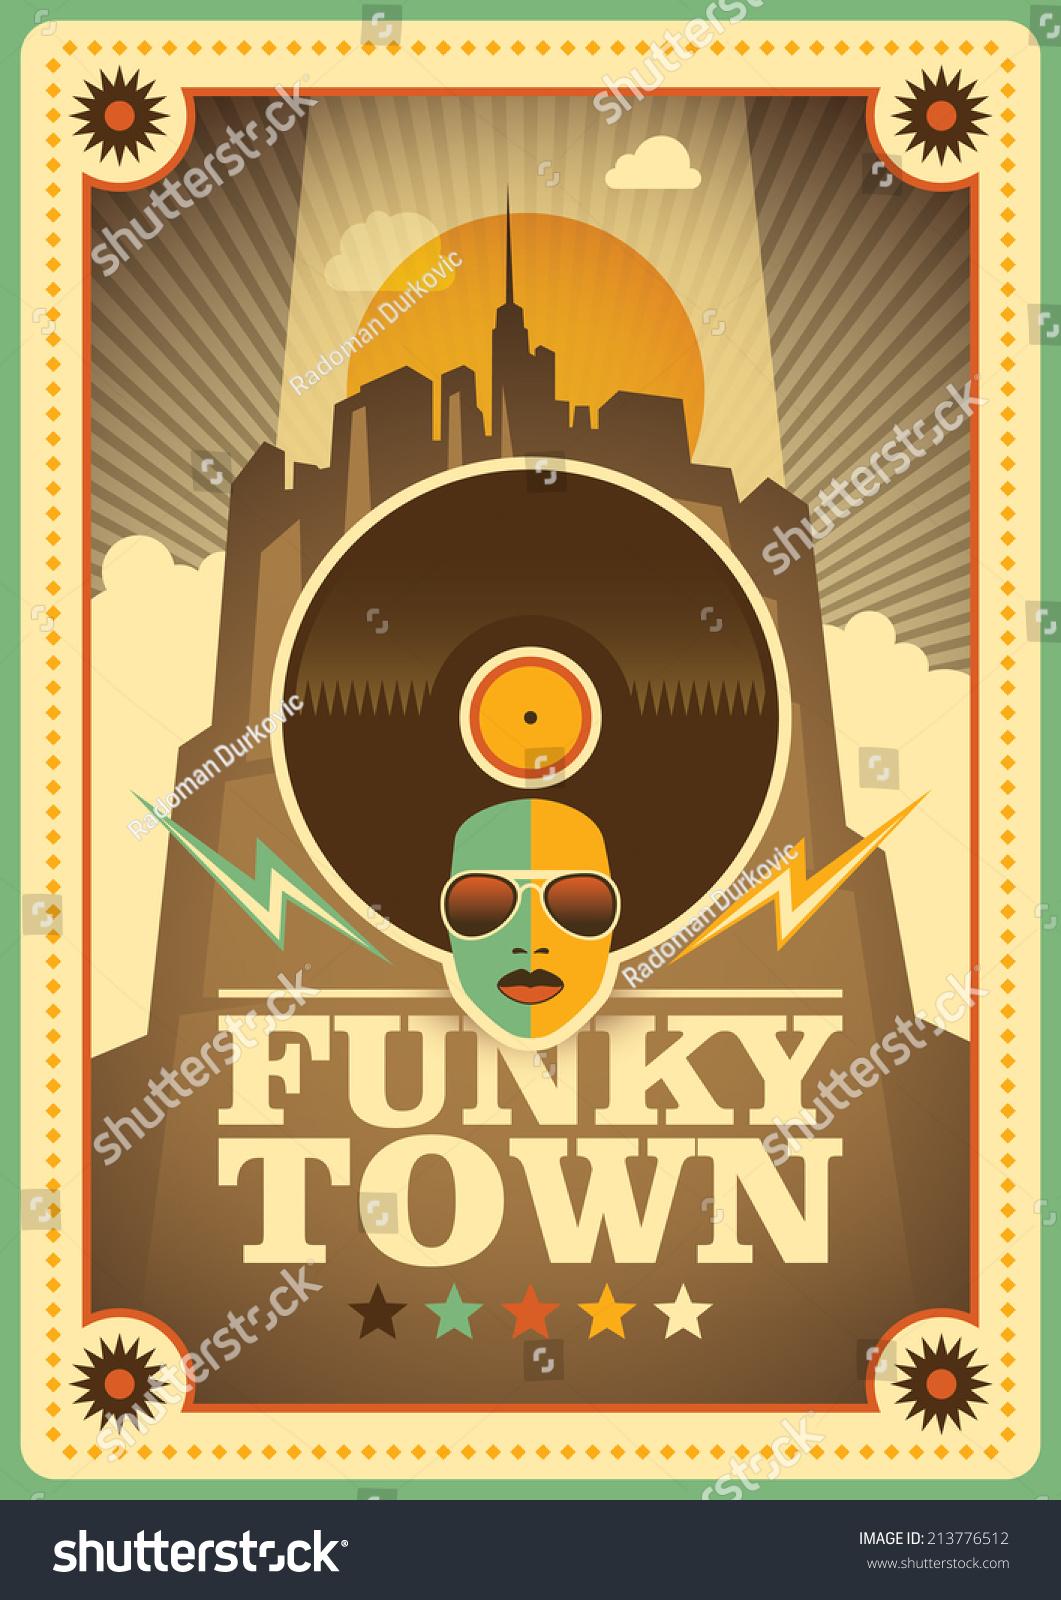 Funky Town Poster Vector Illustration Stock-Vektorgrafik (Lizenzfrei ...